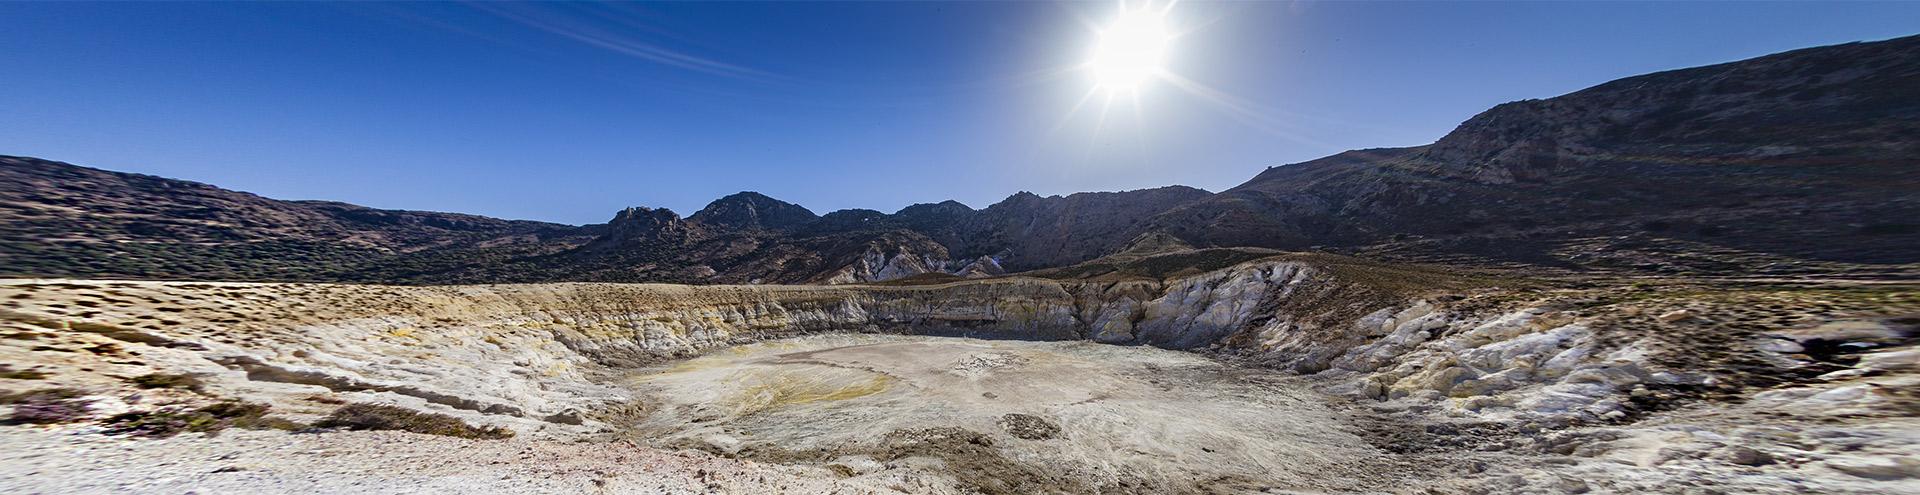 Stefanos-Krater Nisyros